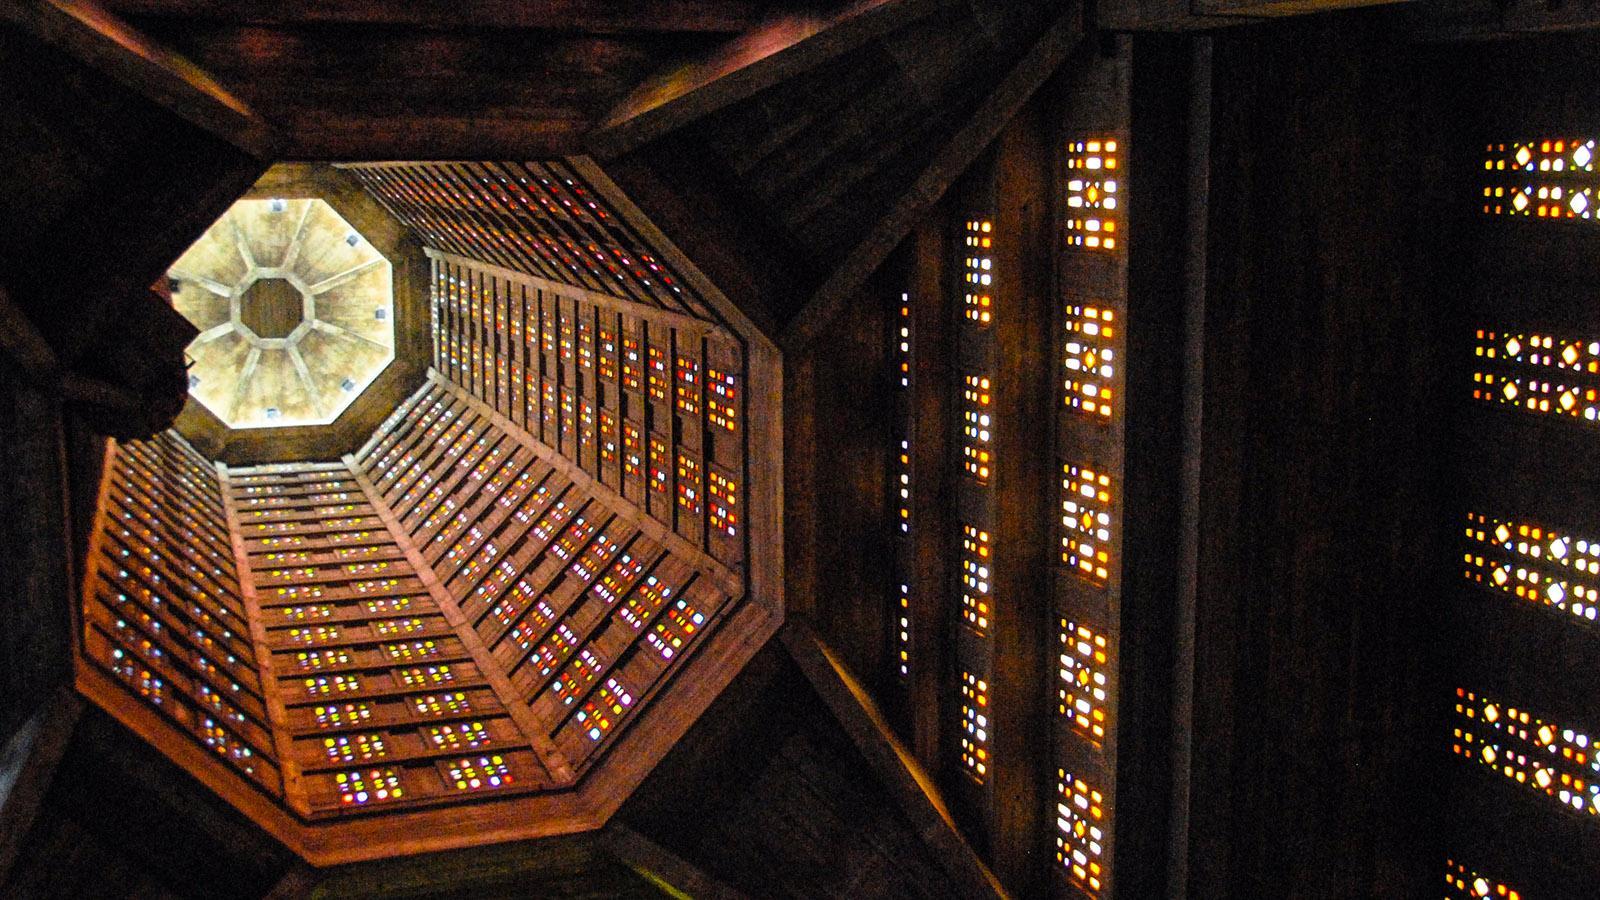 Église Saint Joseph, Le Havre. Blick in den hohen Turm mit seinen Glasfenstern. Foto: Hilke Maunder